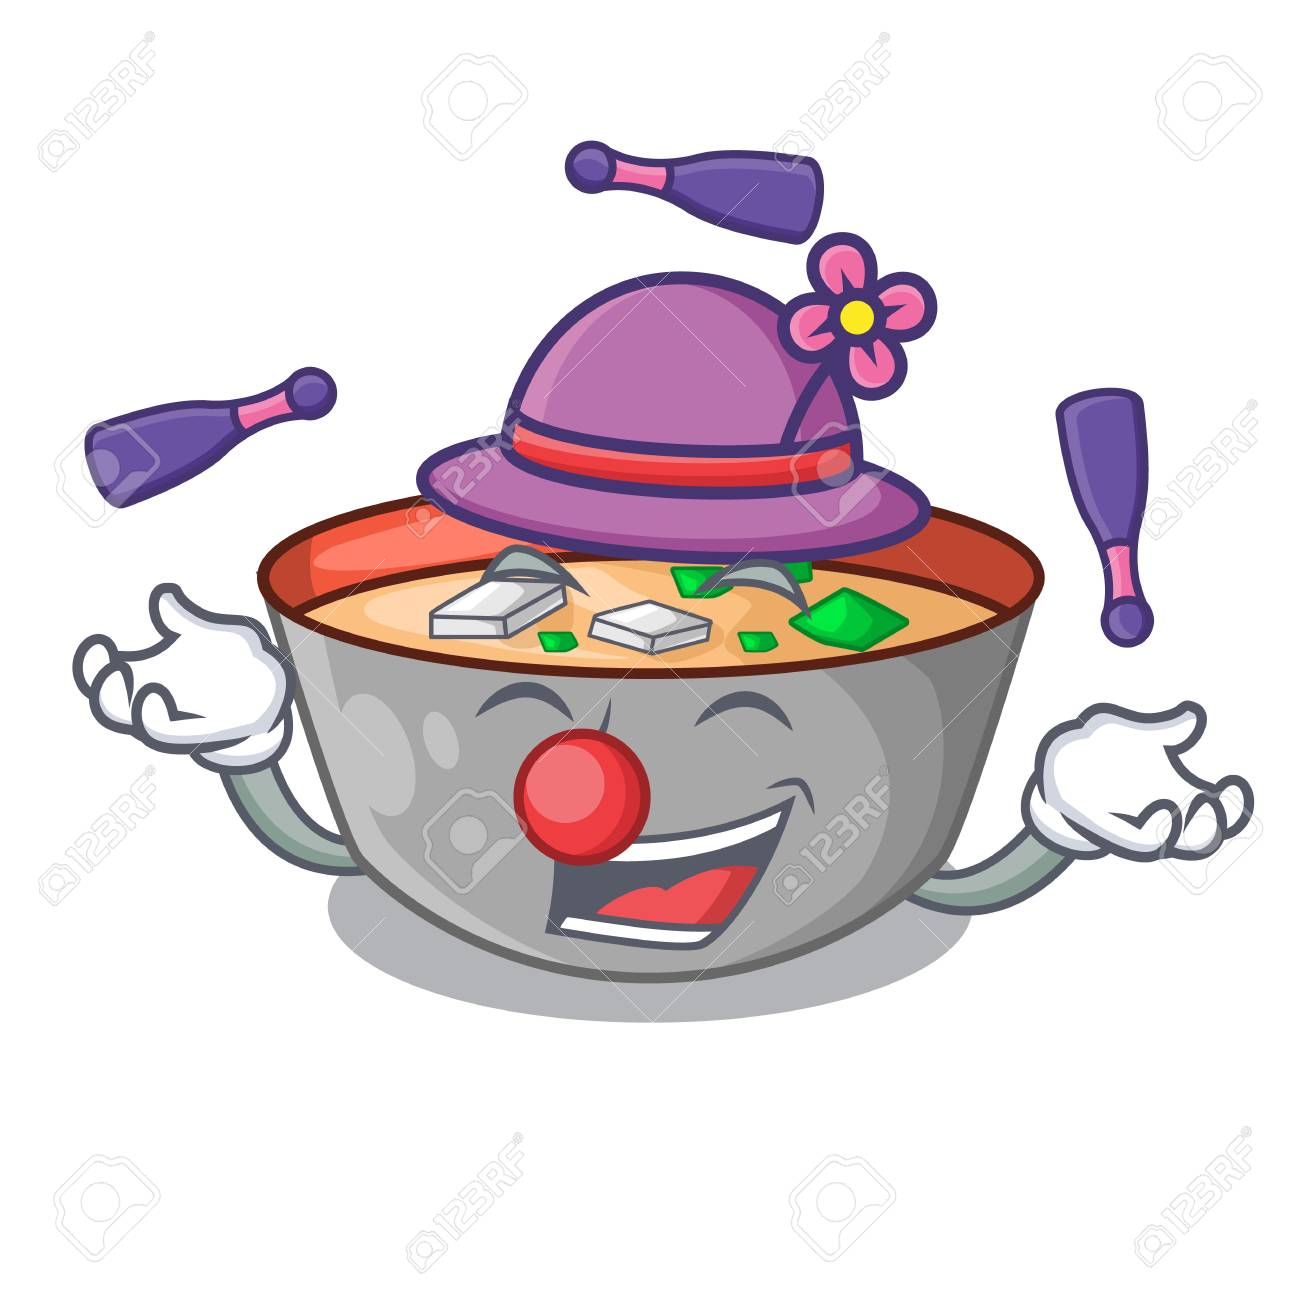 Juggling Delicious Meal Of Miso Soup Cartoon Vector Illustration